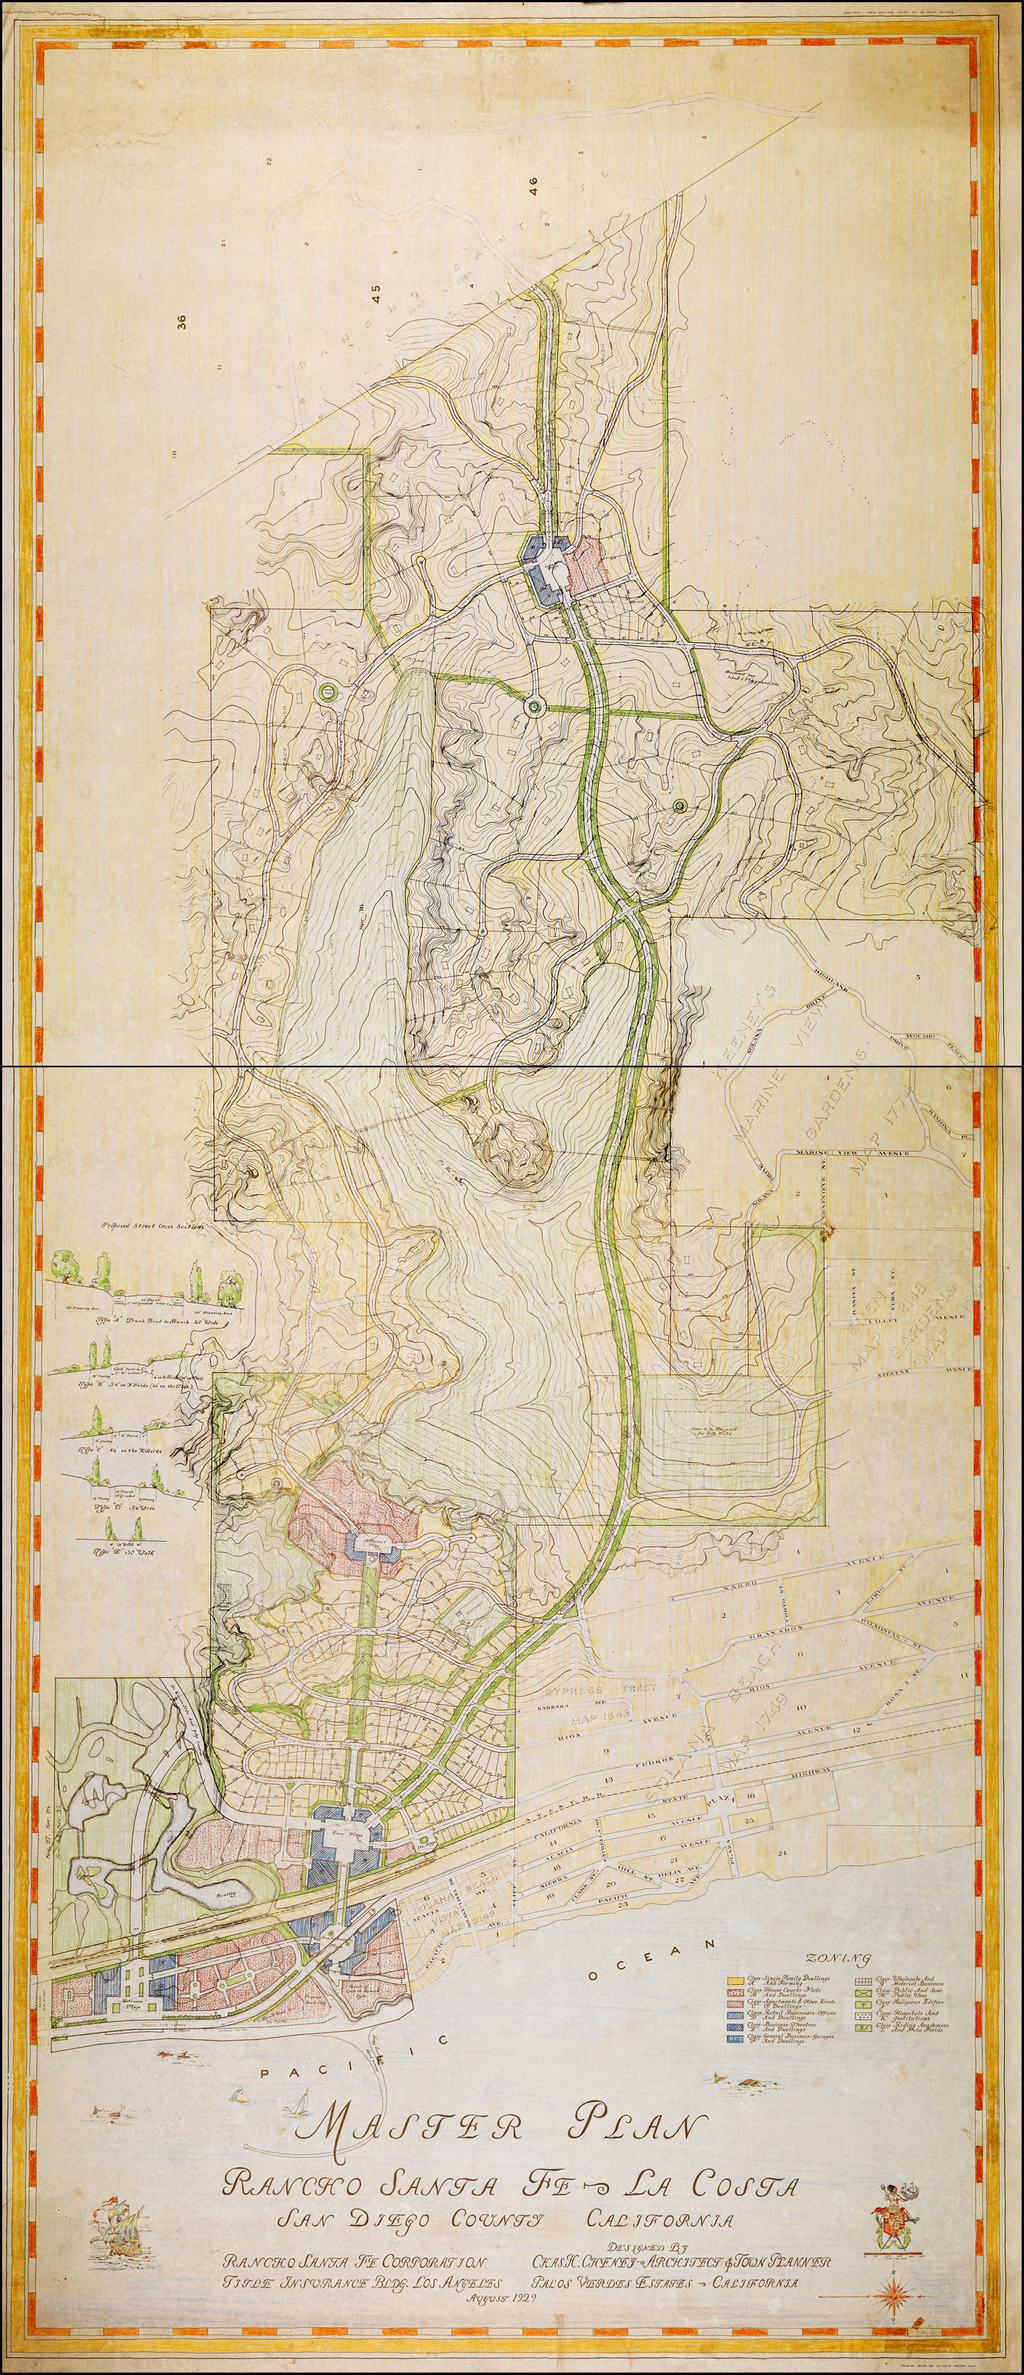 Master Plan | Rancho Santa Fe - La Costa  | San Diego County California . . . August 1929 By Charles Henry Cheney